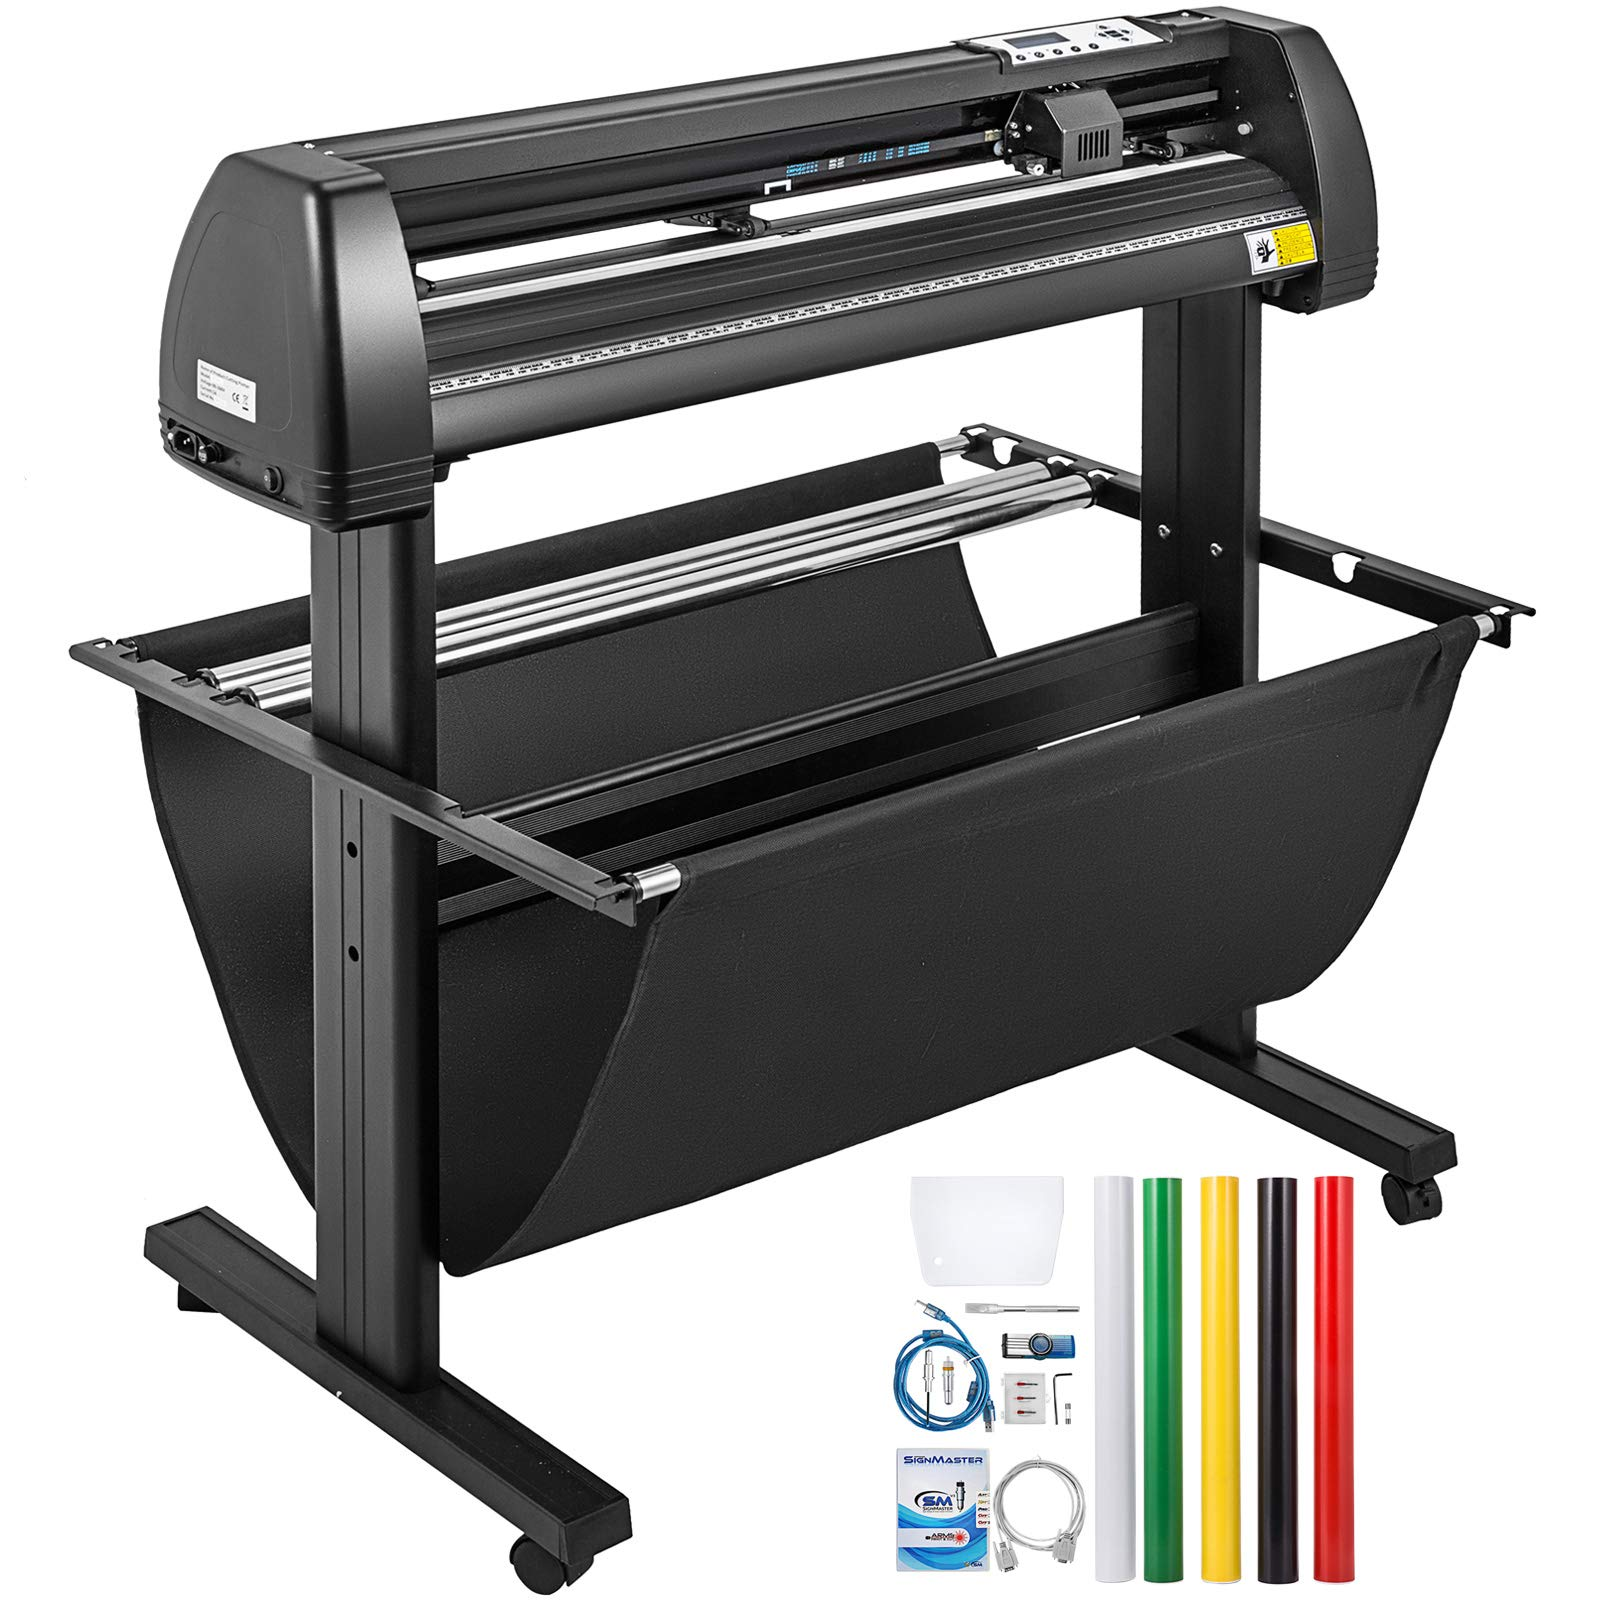 VEVOR Vinyl Cutter 34Inch Vinyl Cutter Machine Manual Vinyl Printer LCD Display Plotter Cutter Sign Cutting with Signmaster Software & Accessories